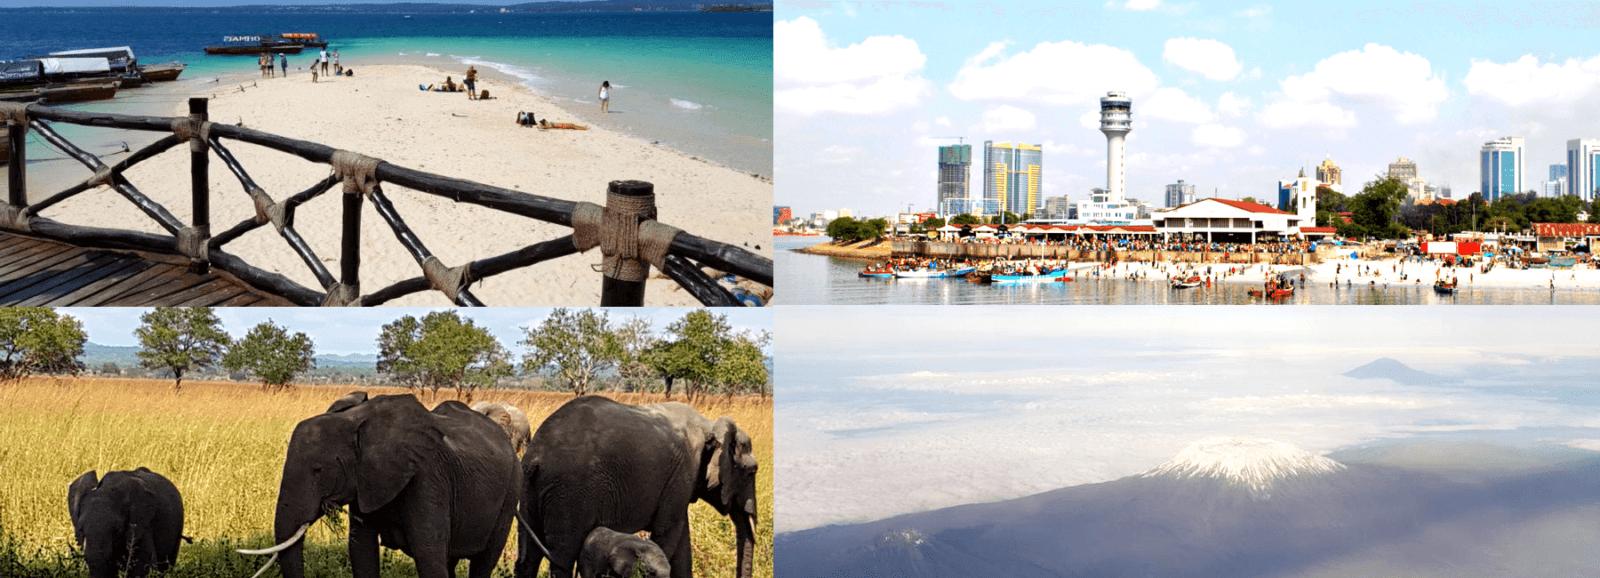 Tanzania Safari City Beach